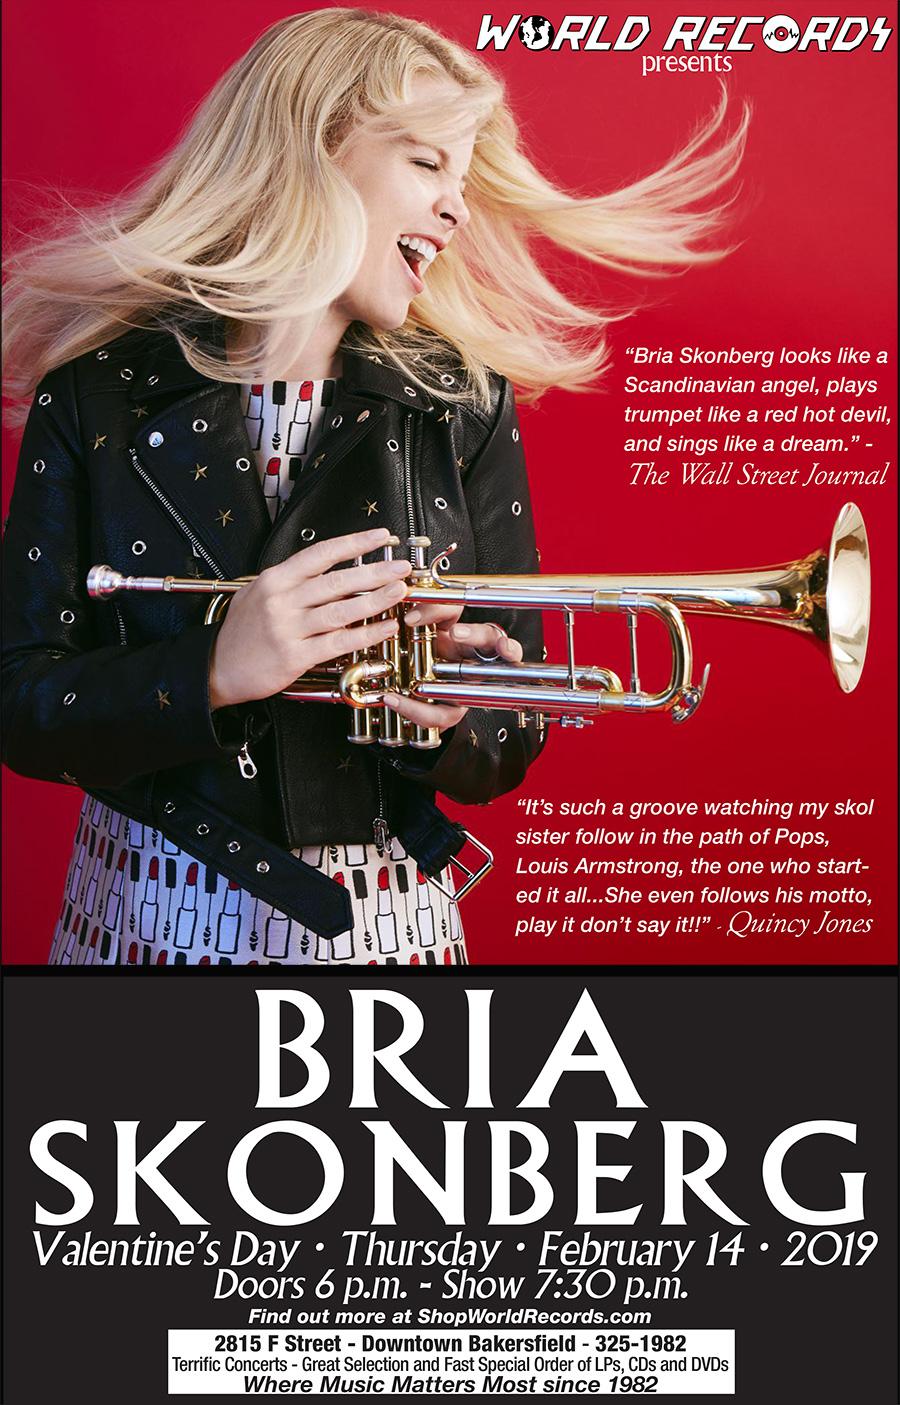 World Records - Bria Skonberg